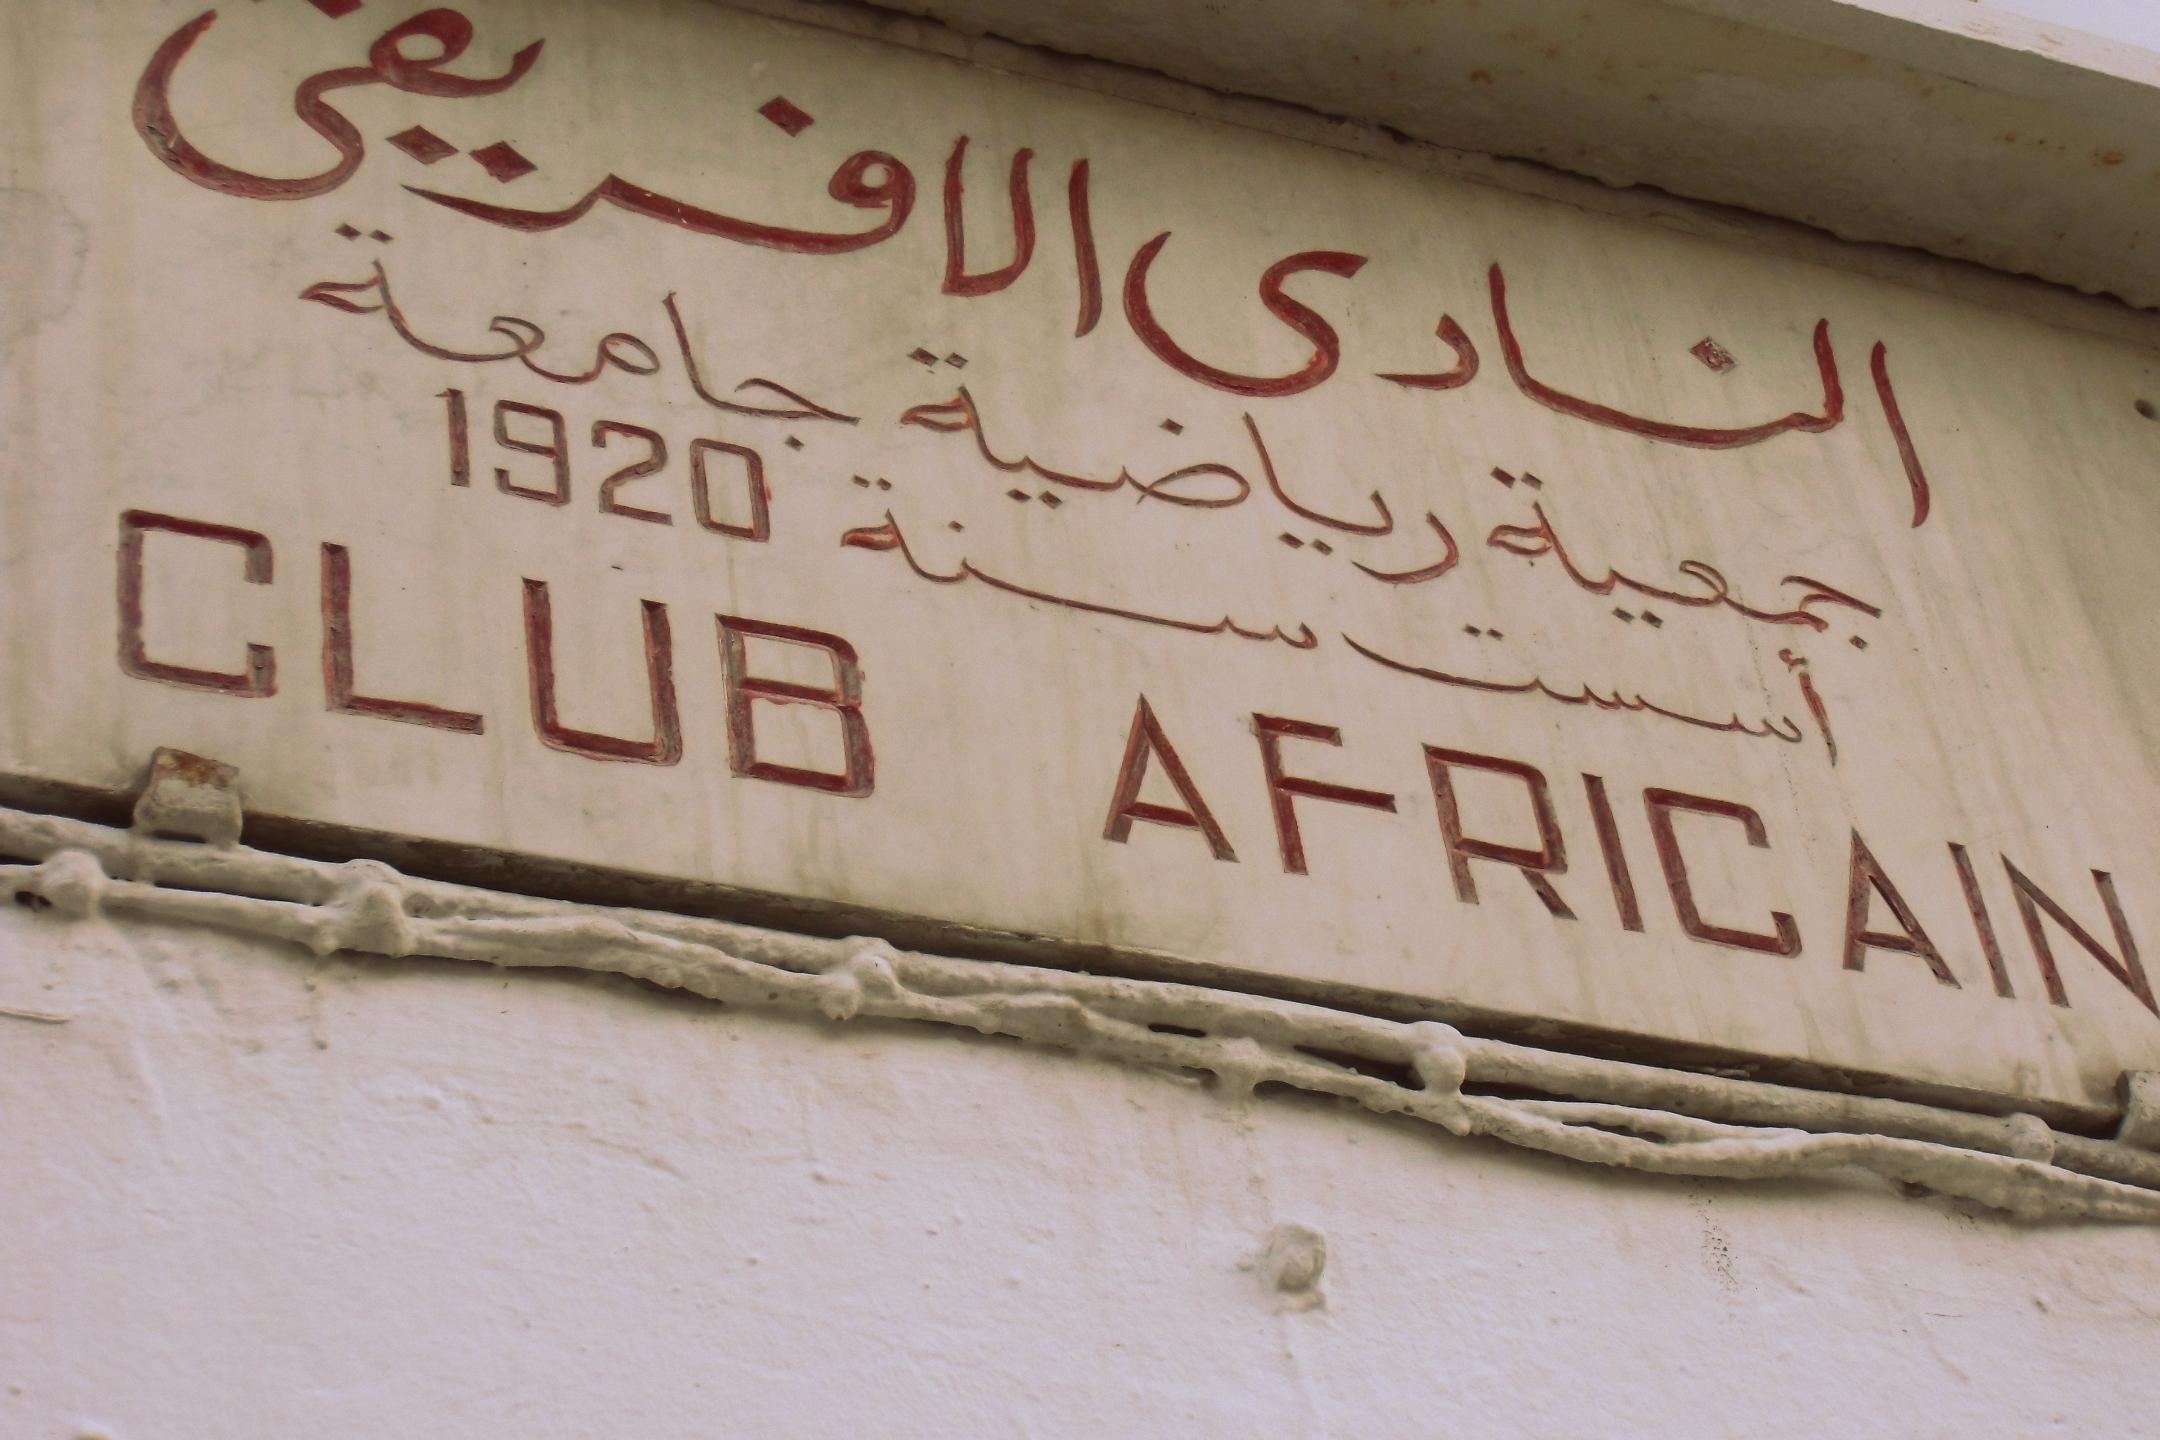 Club Africain - Foto di Alessandro Doranti